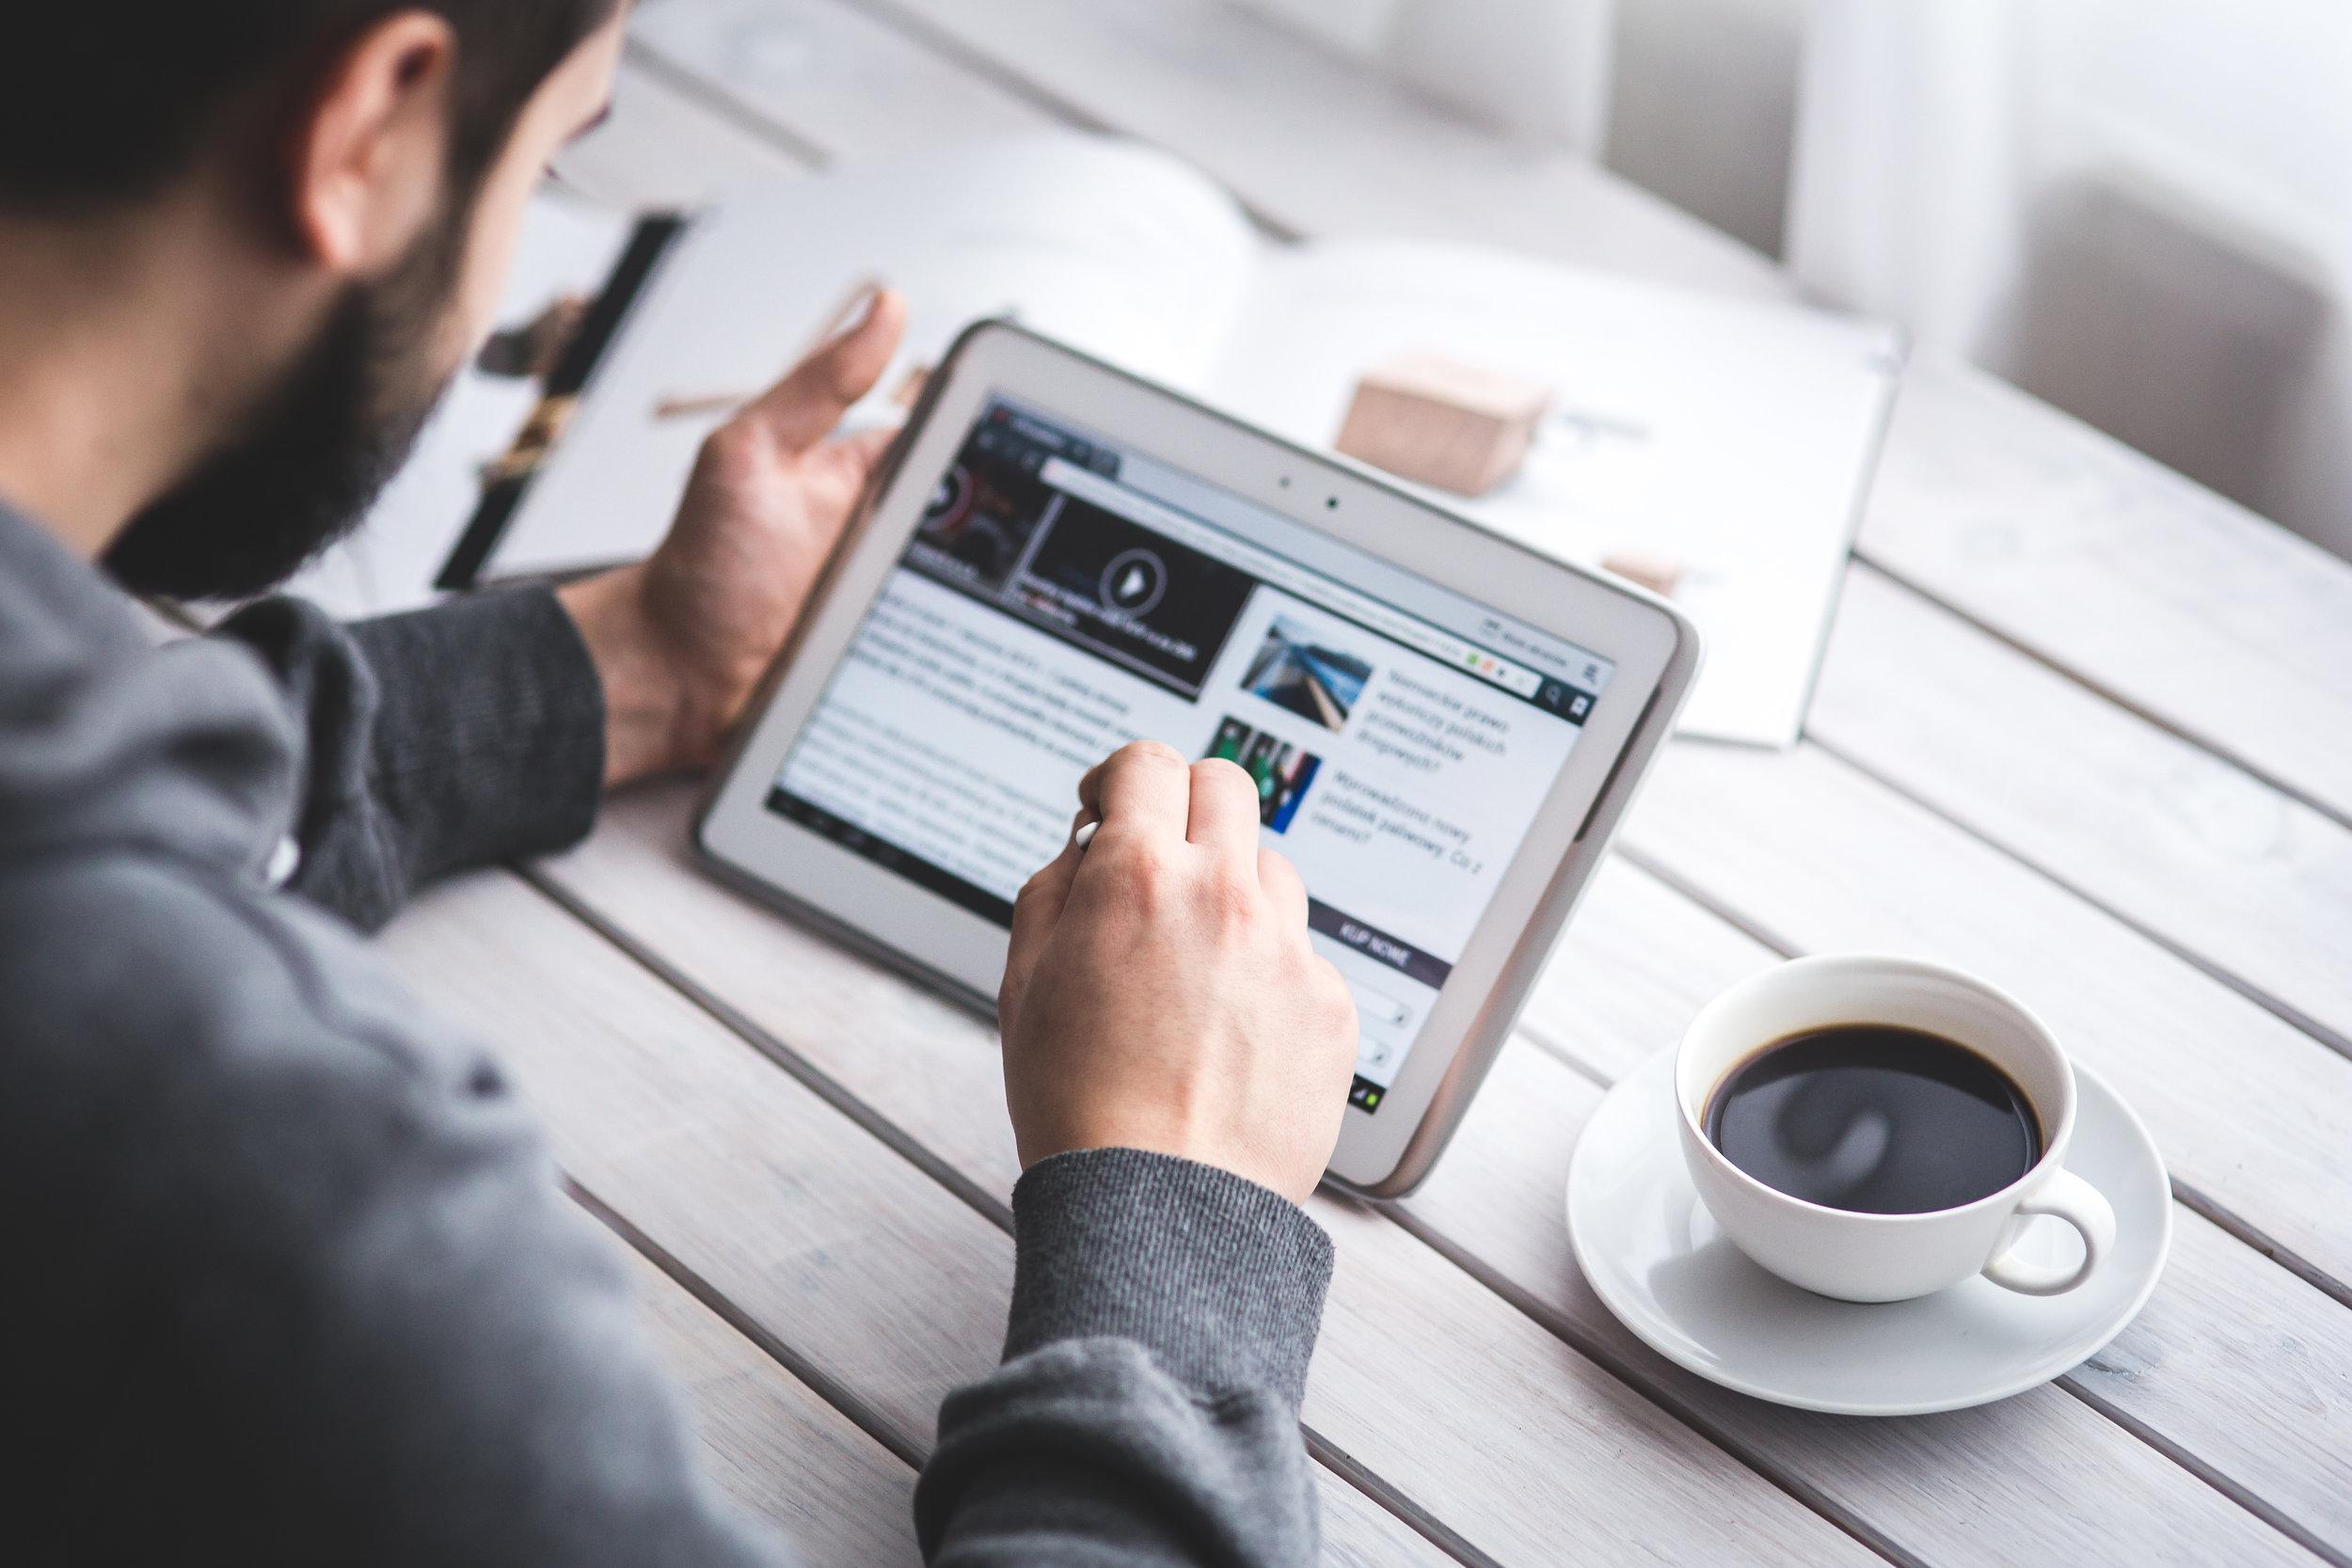 social media detox overload digital tech